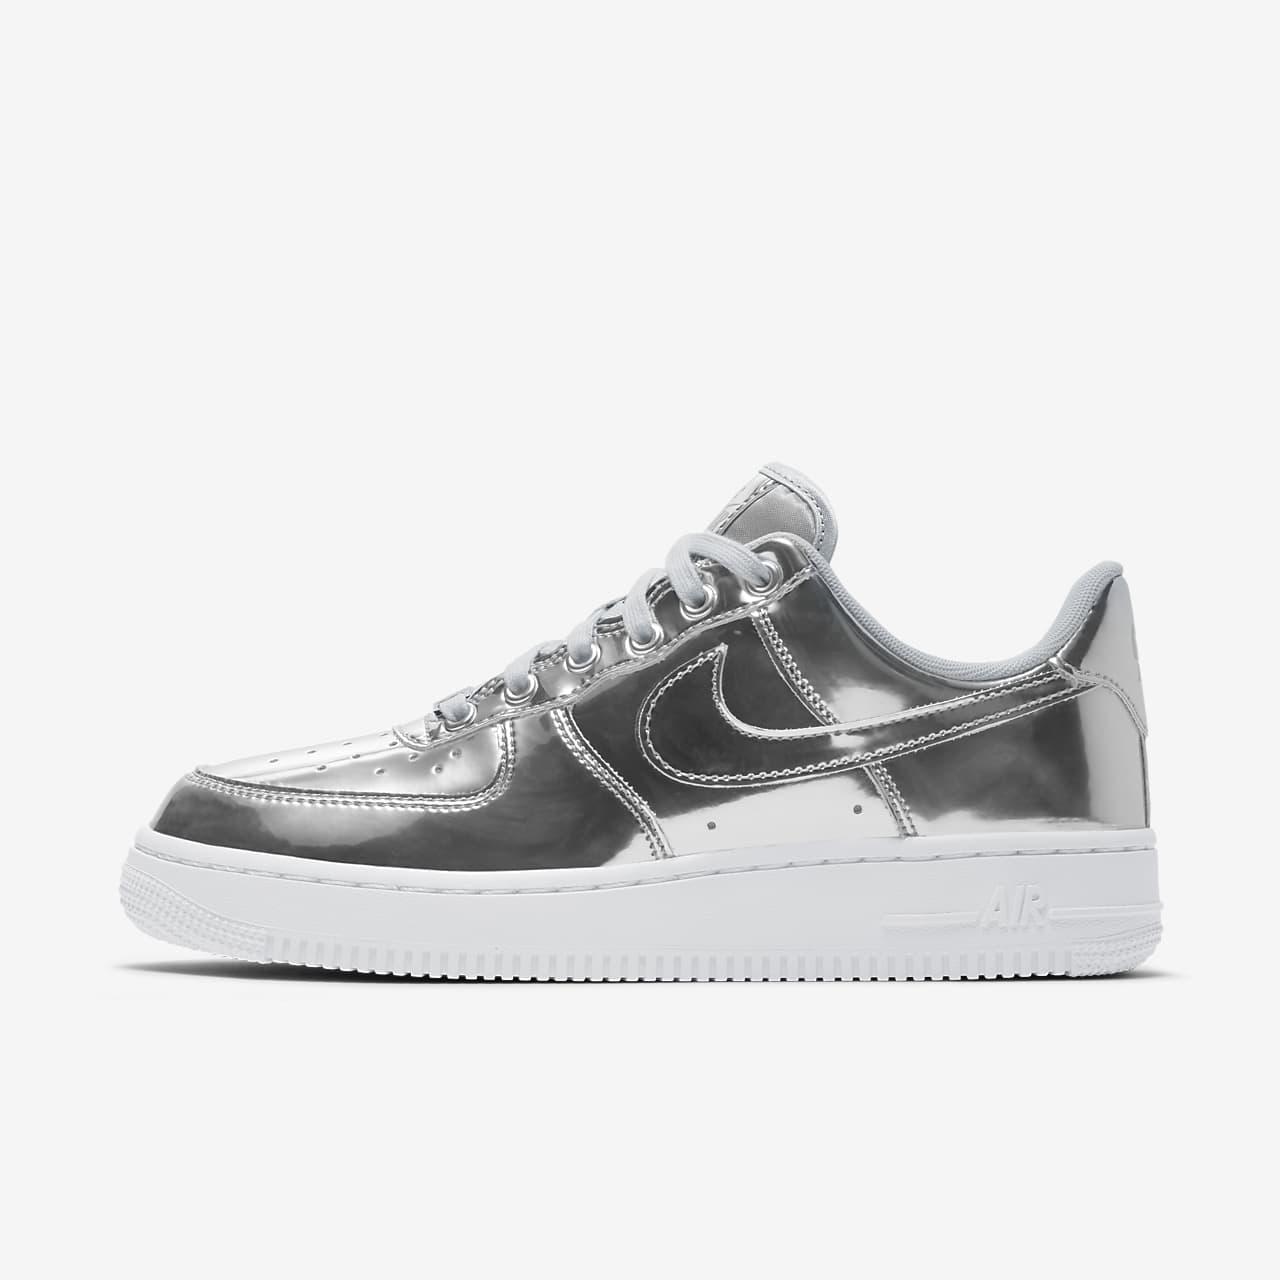 Nike Air Force 1 SP 女子运动鞋